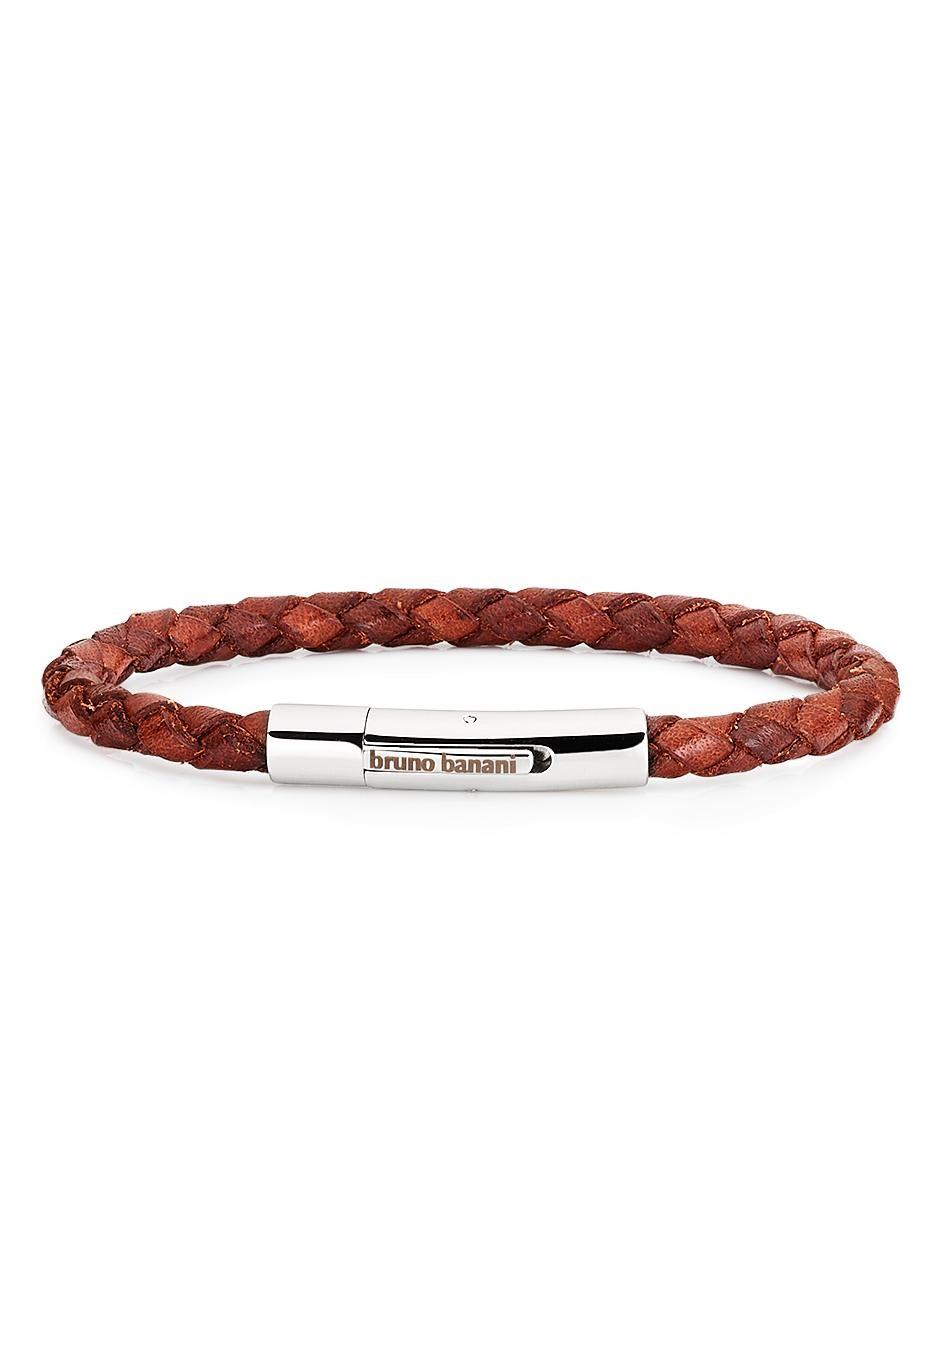 Bruno Banani Armband B4006B/20/00 | Schmuck > Armbänder > Sonstige Armbänder | Bruno Banani